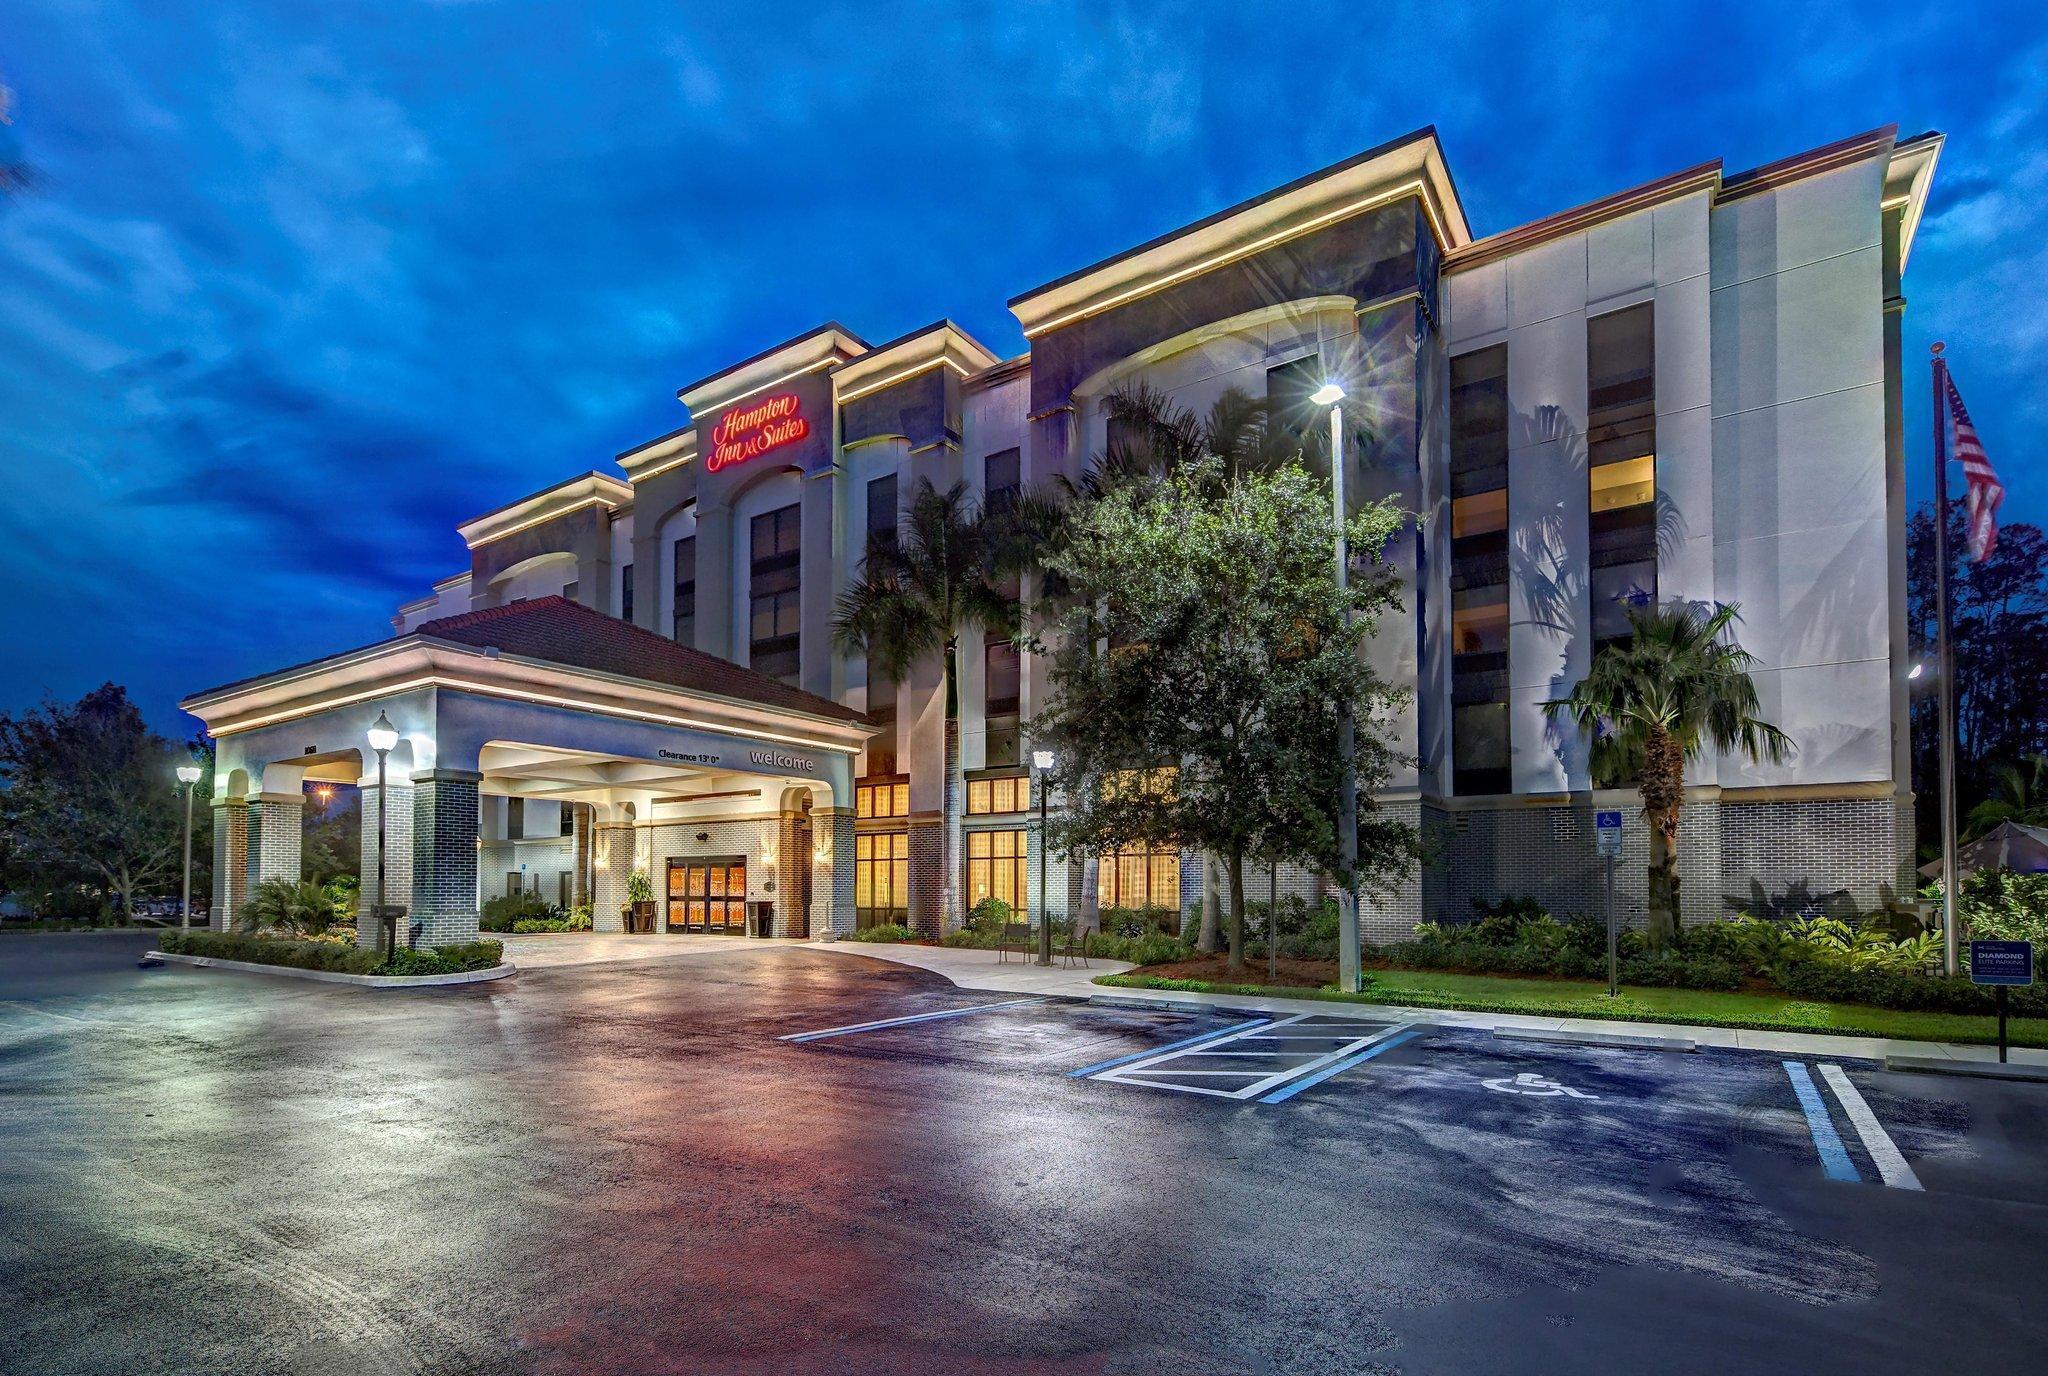 Hampton Inn And Suites Ft. Myers Estero